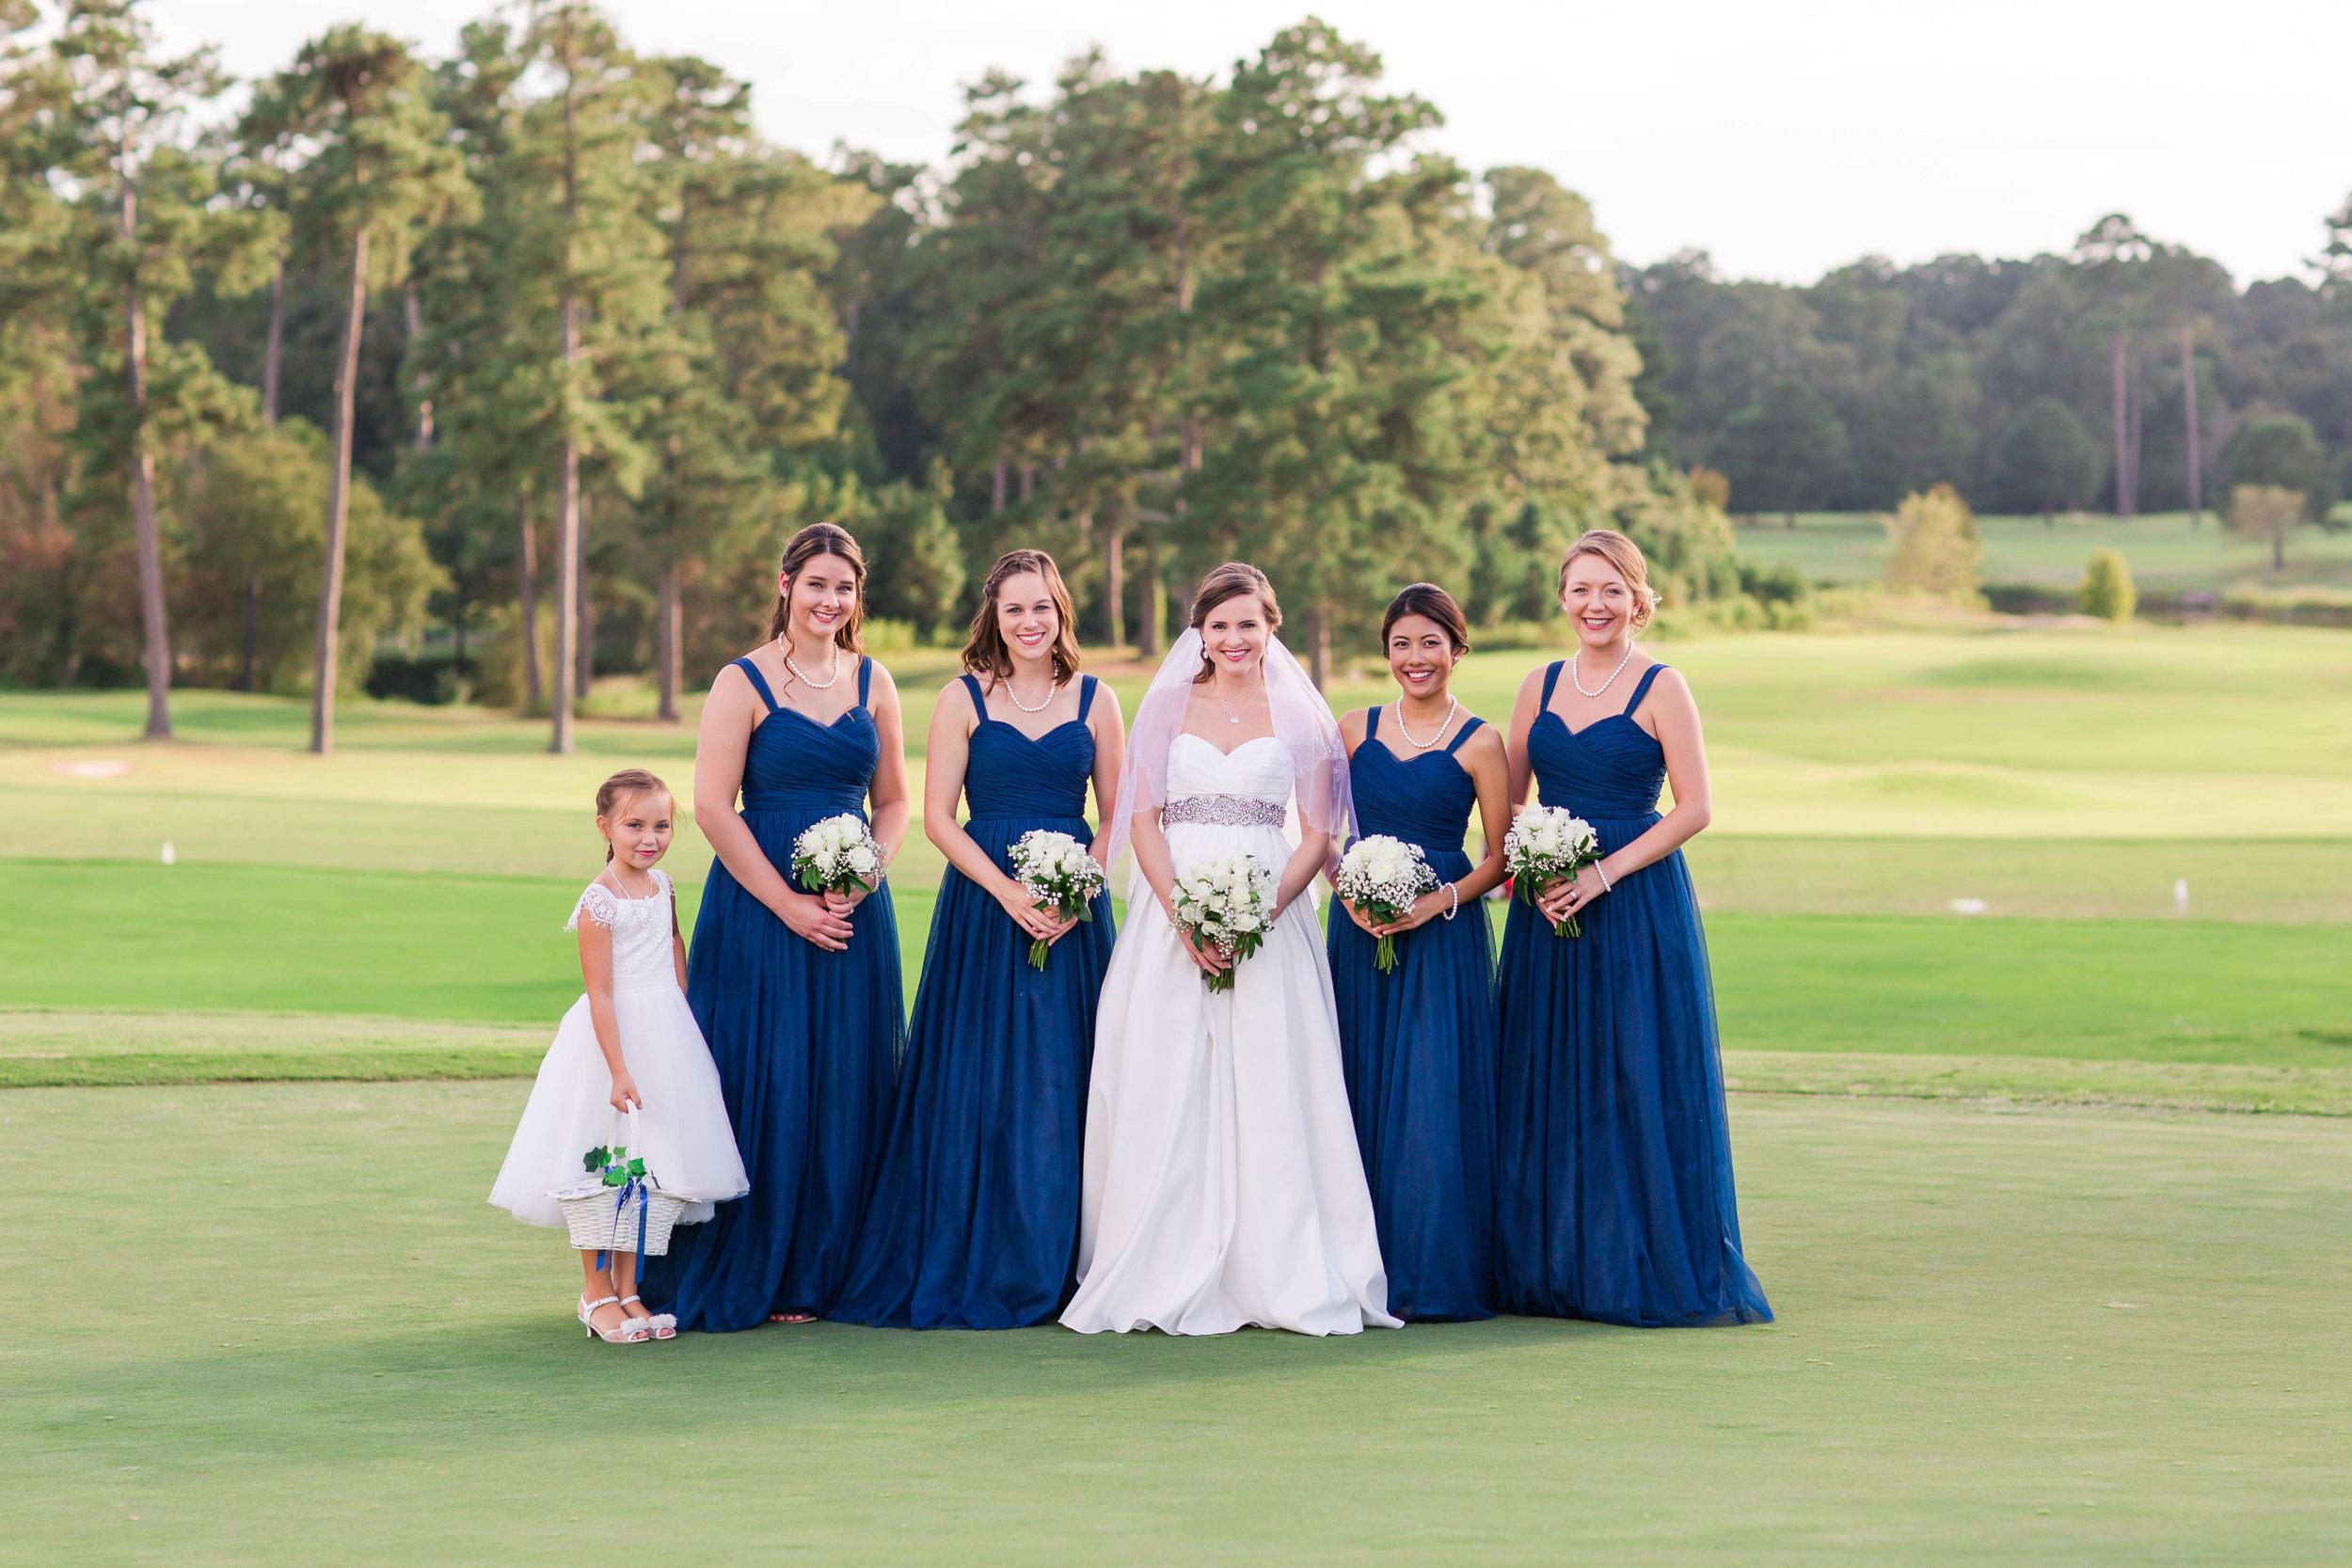 Hollomans_Family and Bridal Party_10.jpg